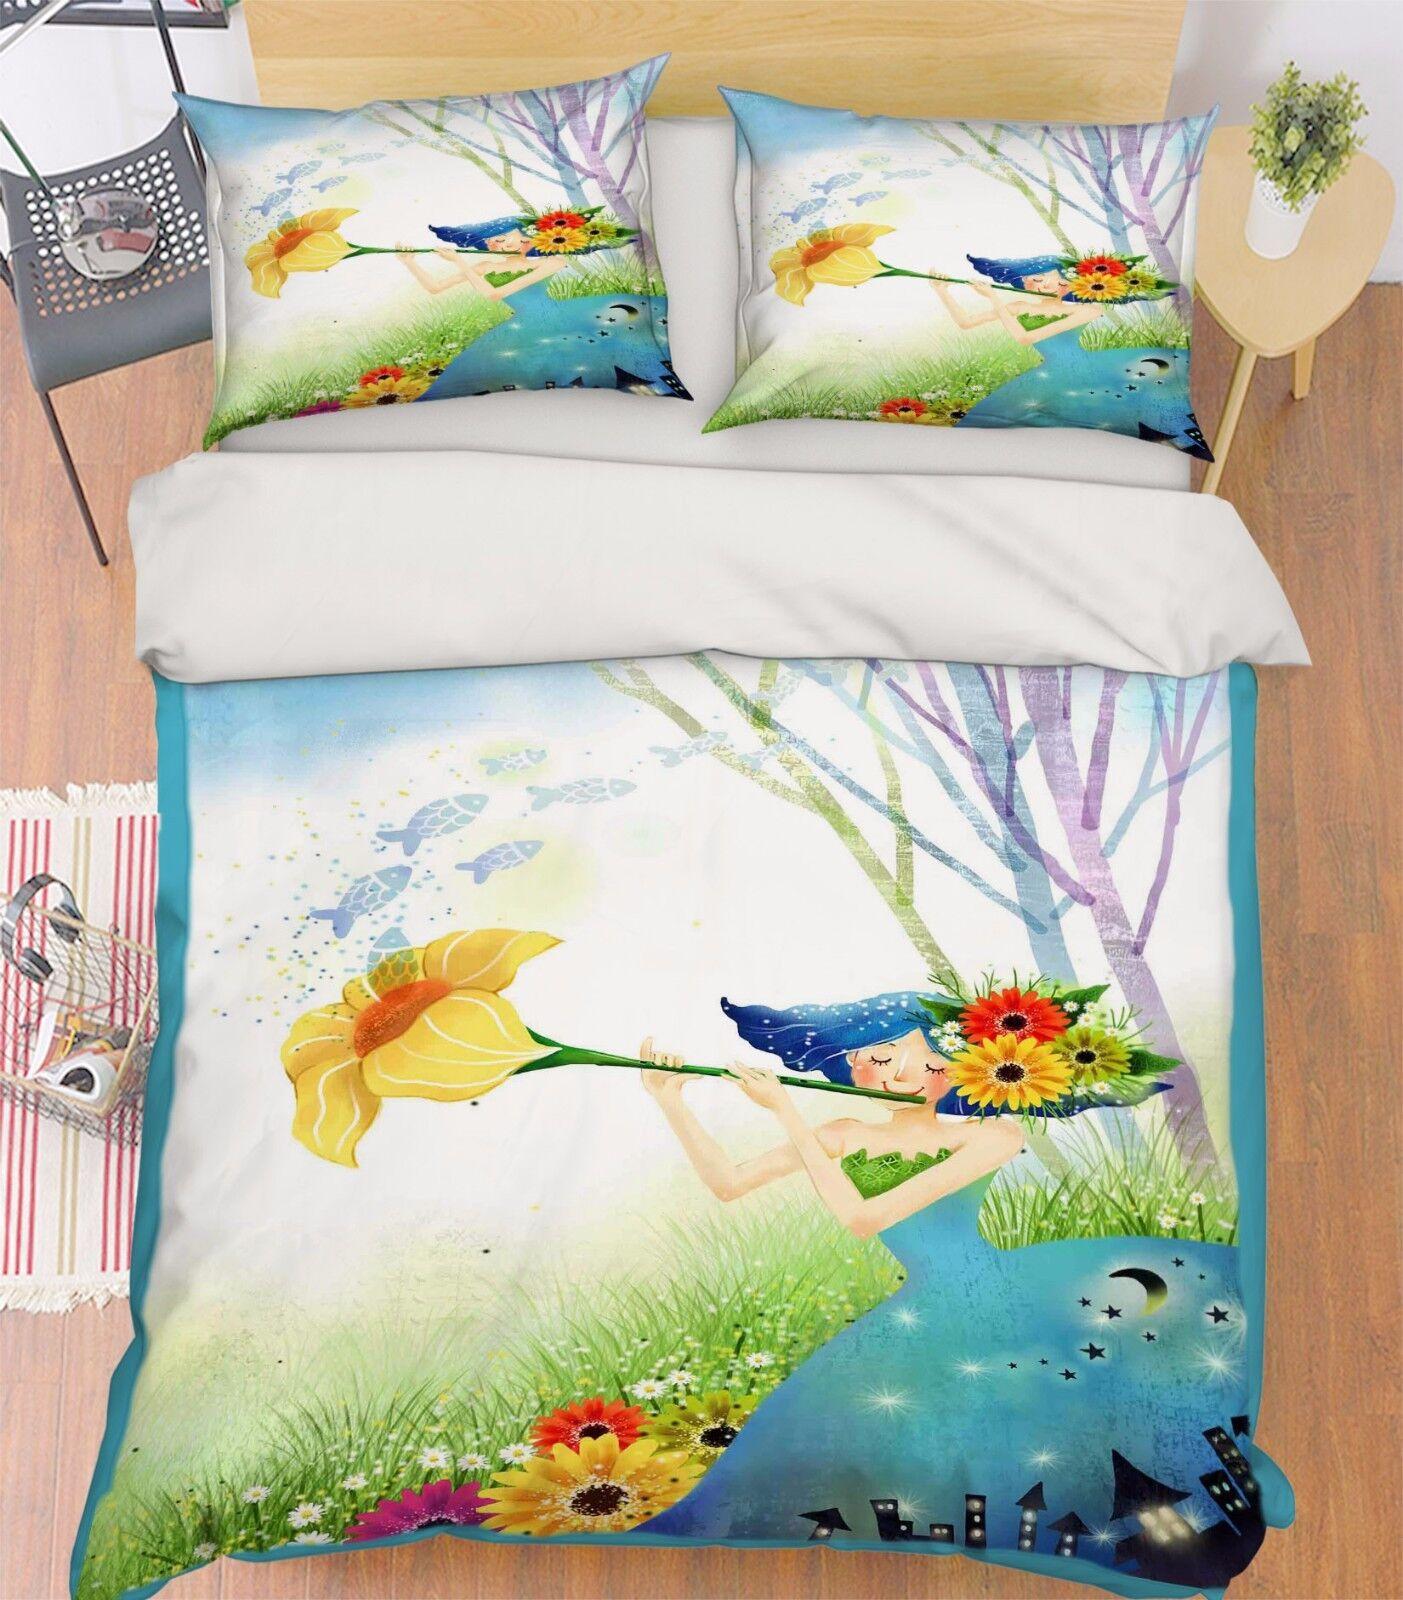 3D Flower Girl 744 Bed Pillowcases Quilt Duvet Cover Set Single Queen UK Summer